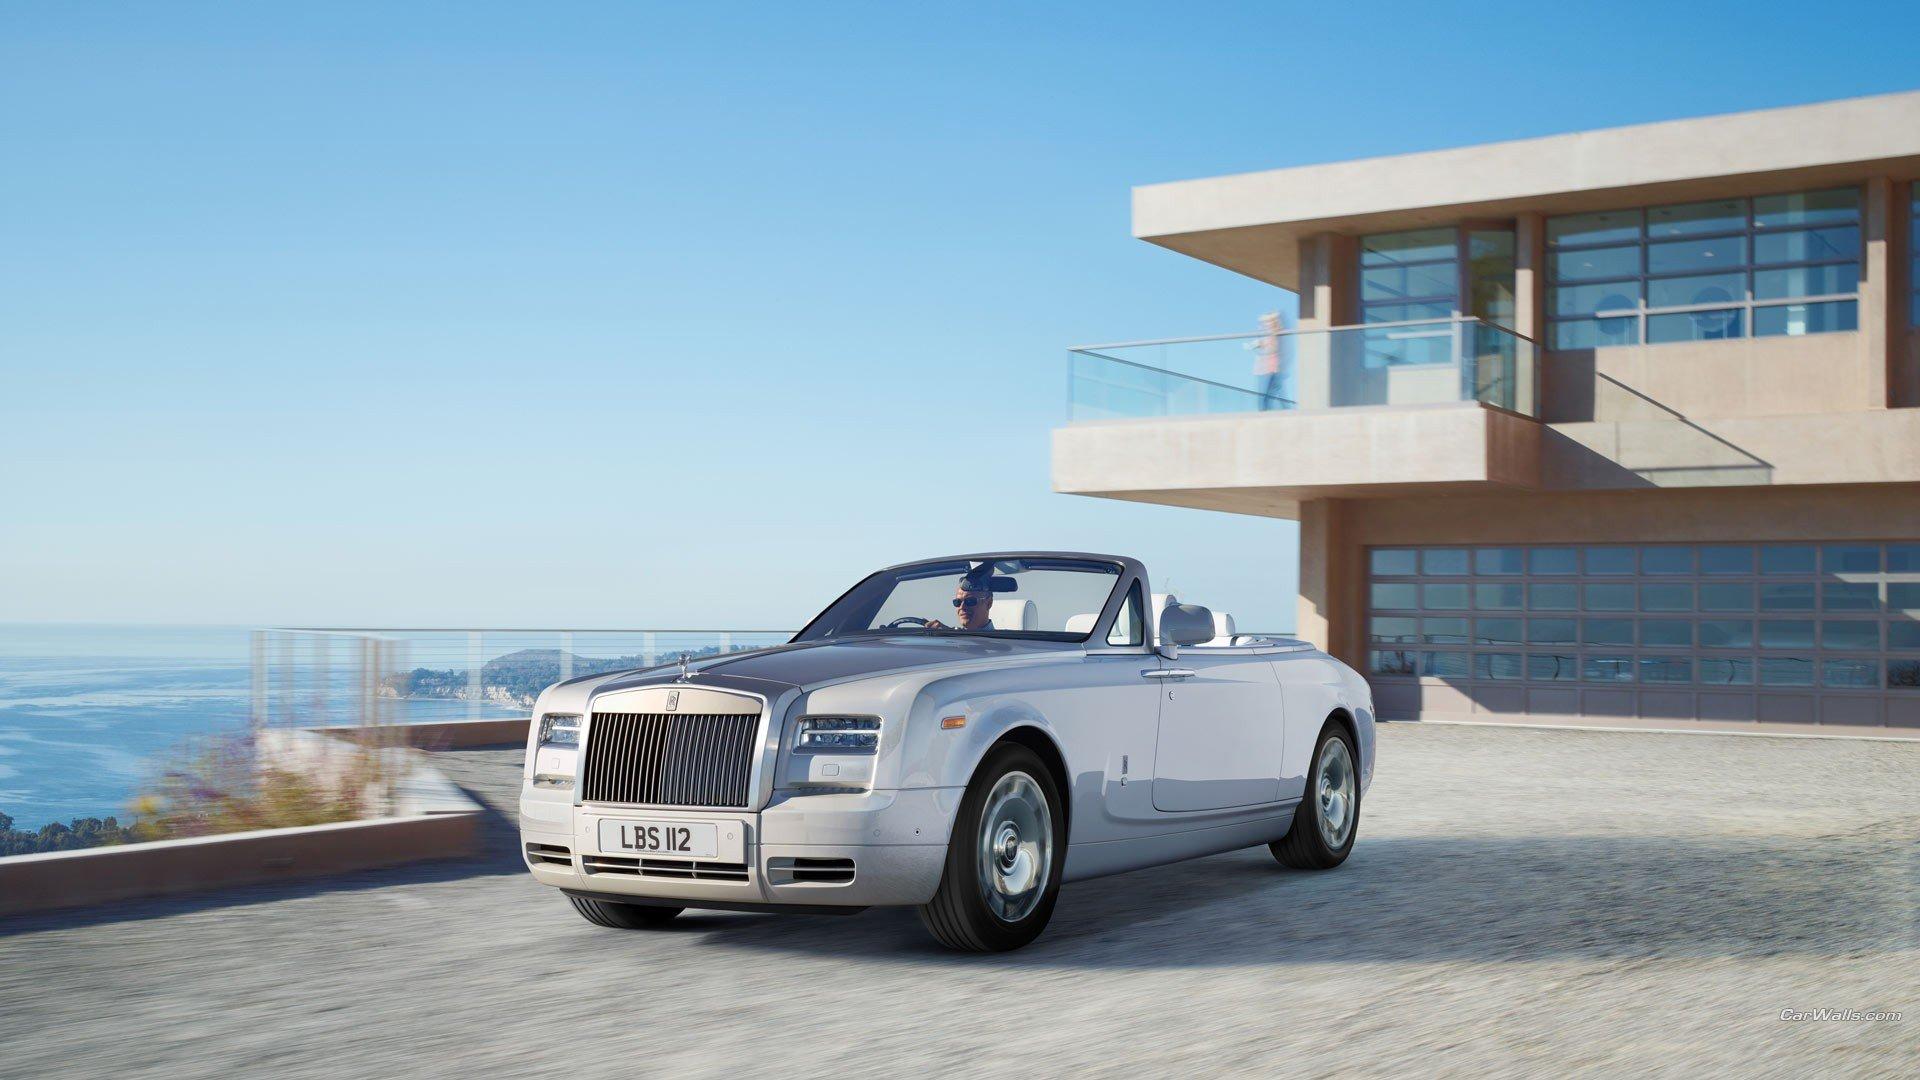 Rolls Royce Phantom Wallpapers 1920x1080 Full Hd 1080p Desktop